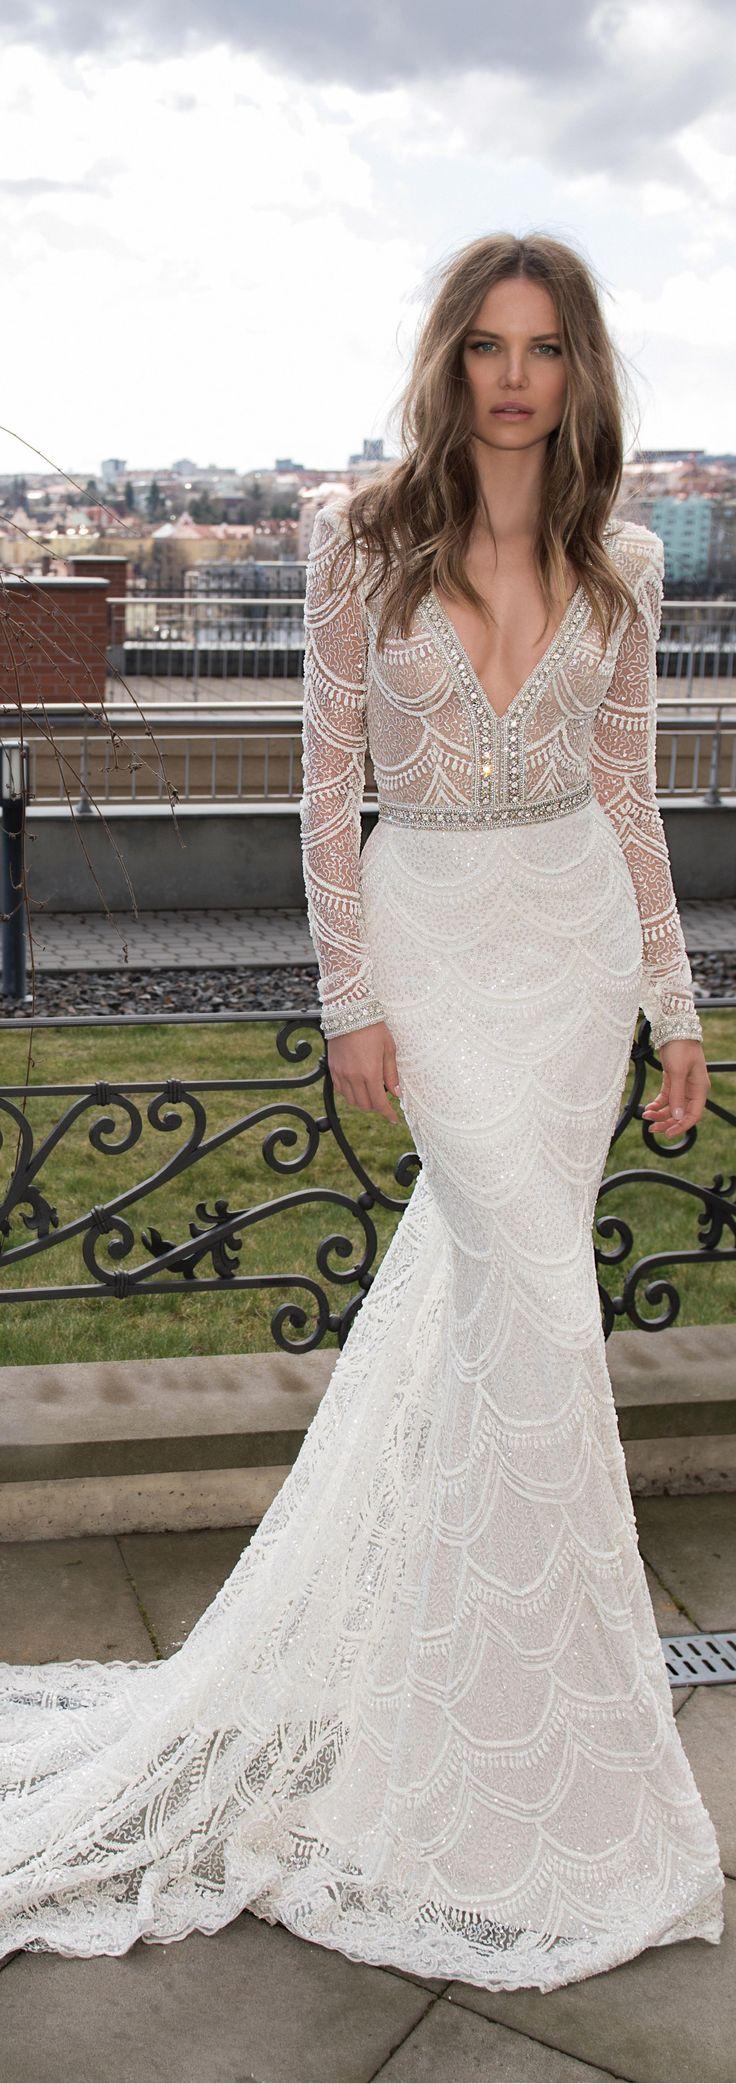 best wedding images on pinterest homecoming dresses straps